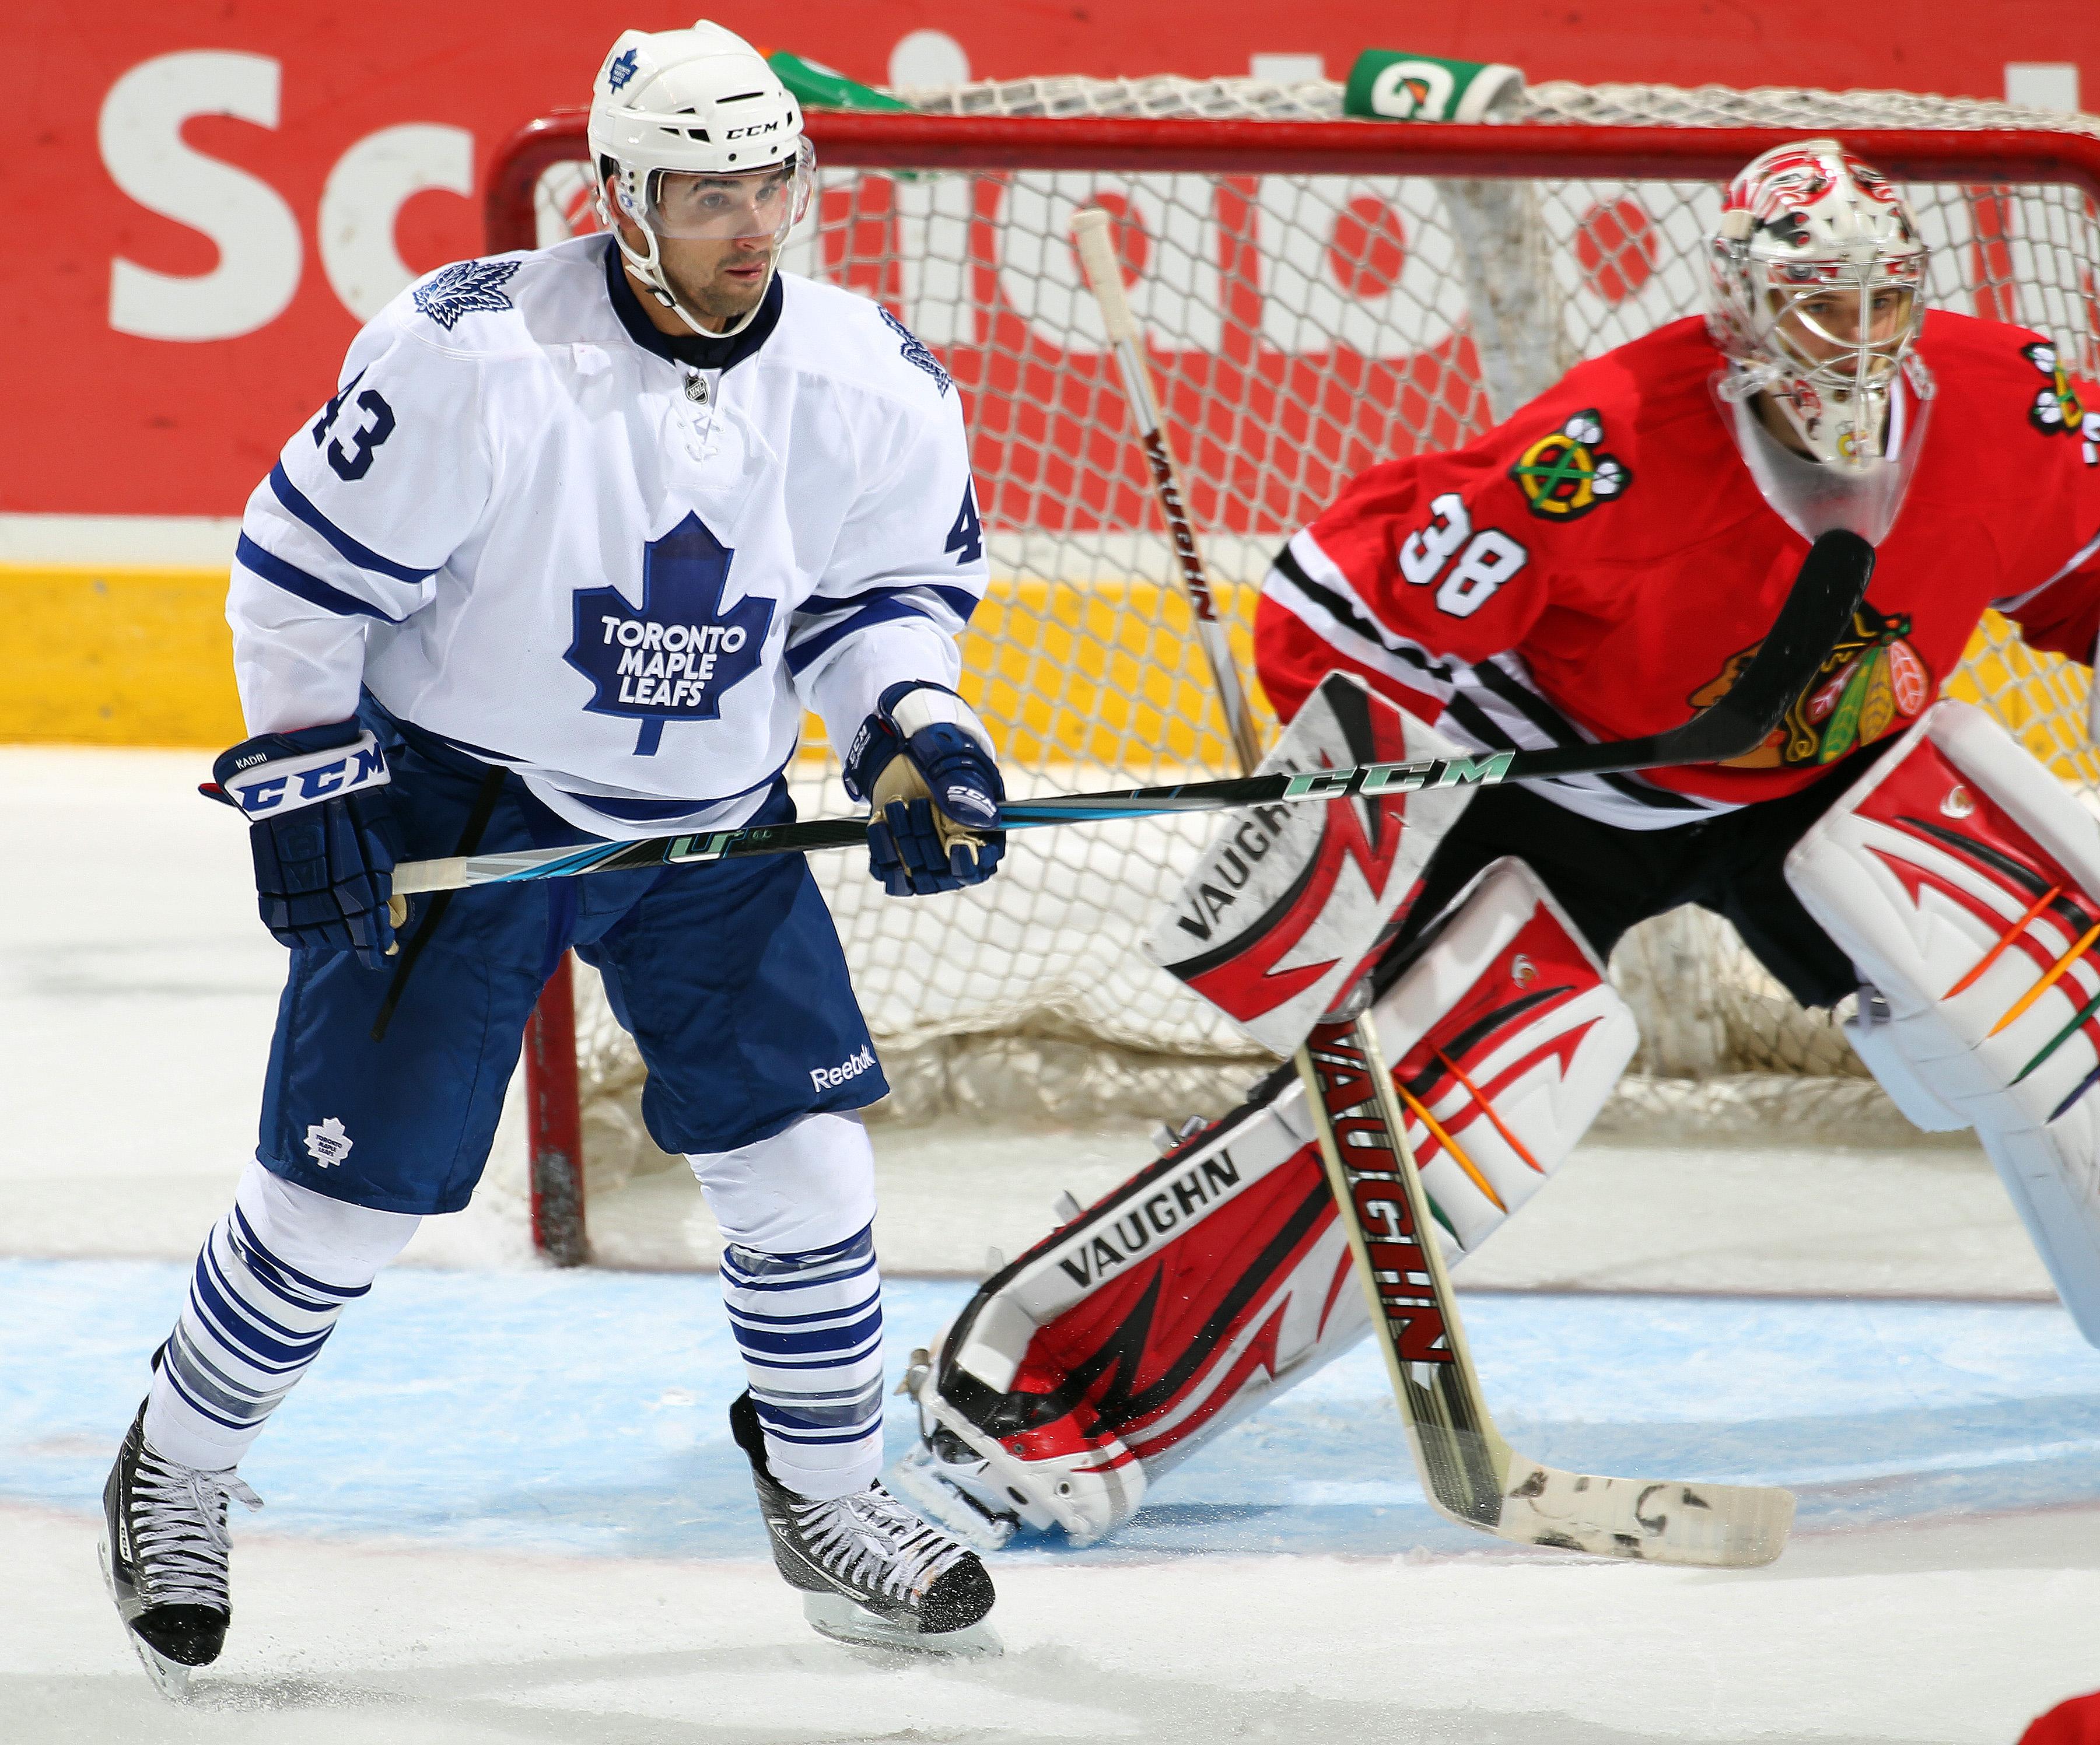 NHL Rookie Tournament - Chicago Blackhawks v Toronto Maple Leafs